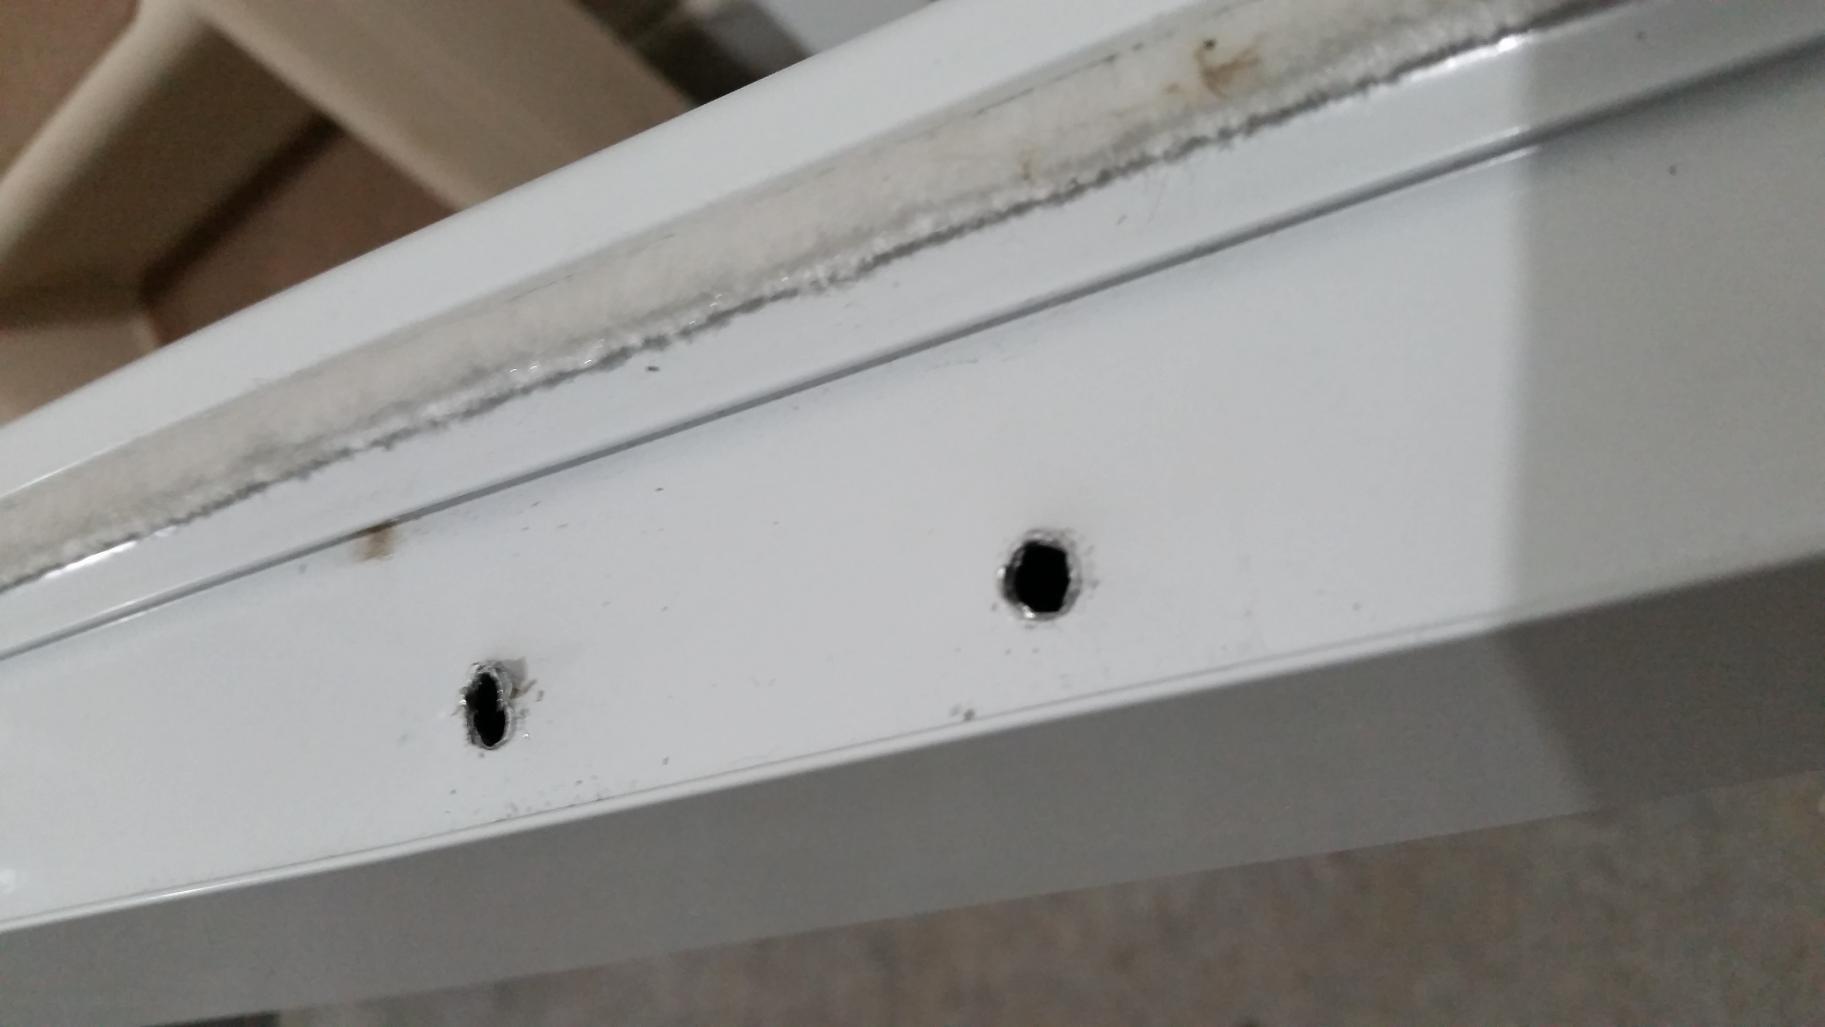 Storm Door Screws Stripped Now What Doityourself Community